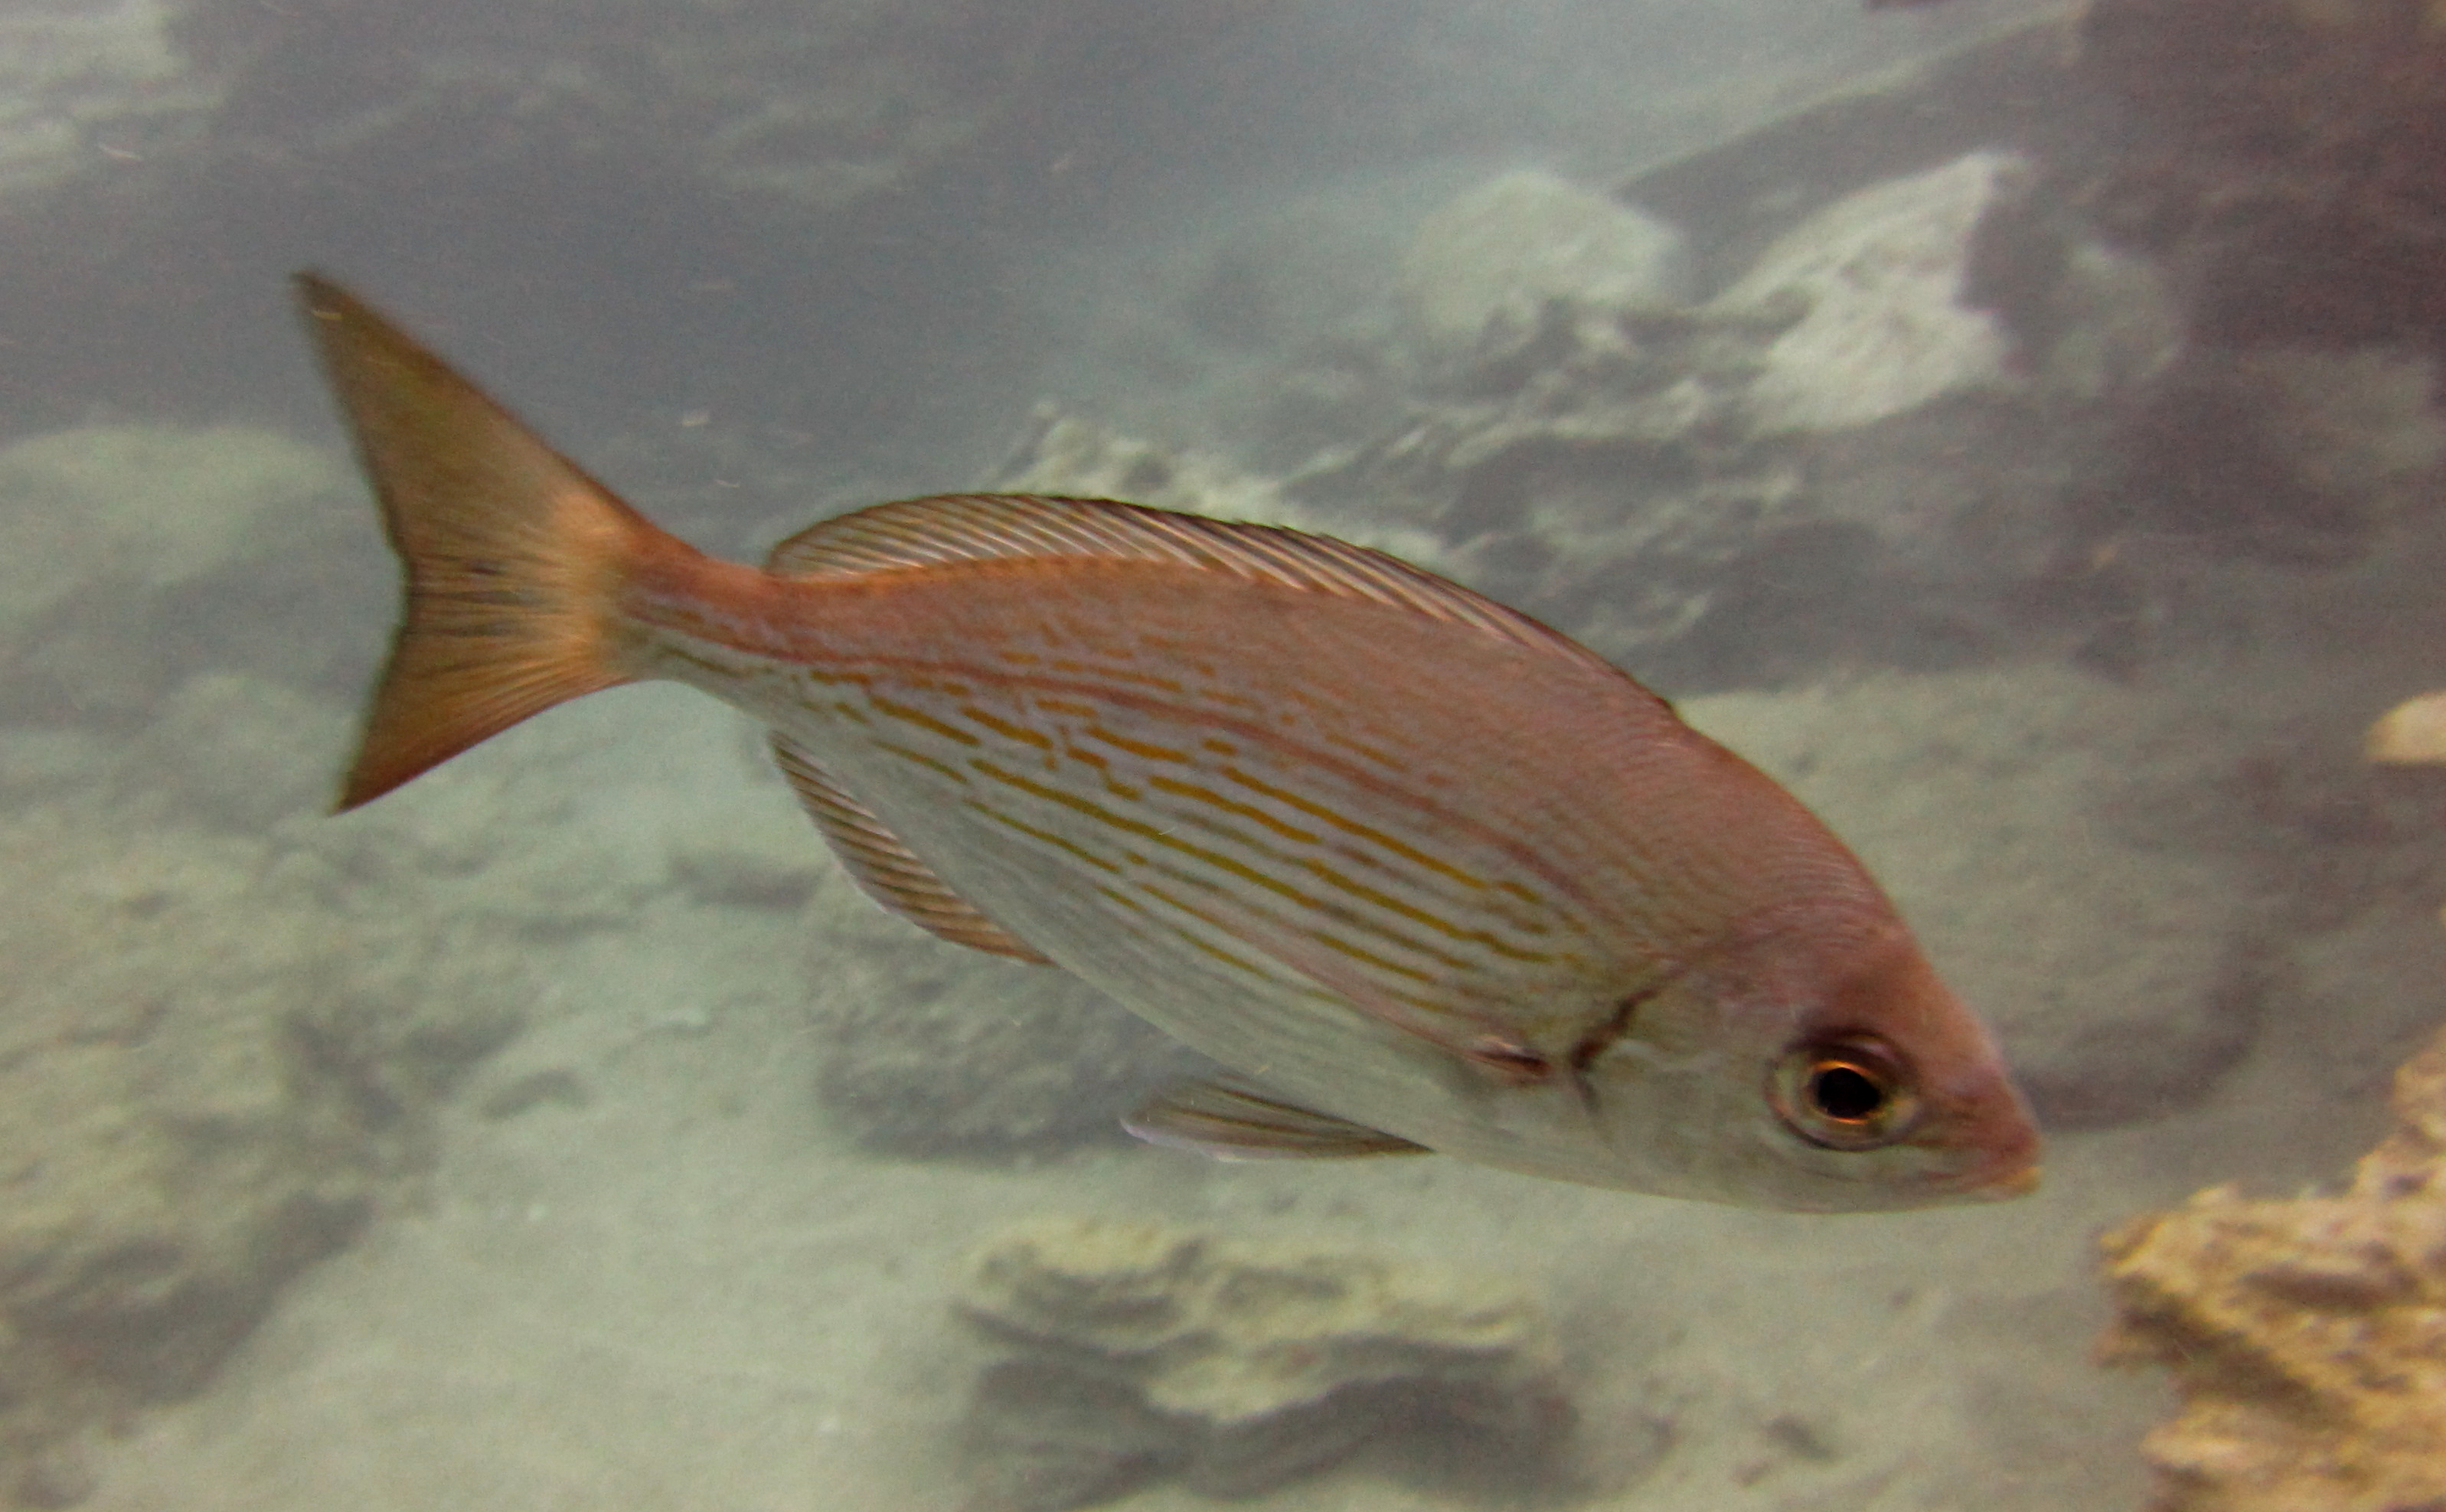 Diving-Tenerife-Aquatic-Life-Sharks-Sting-Rays-Fish (79)